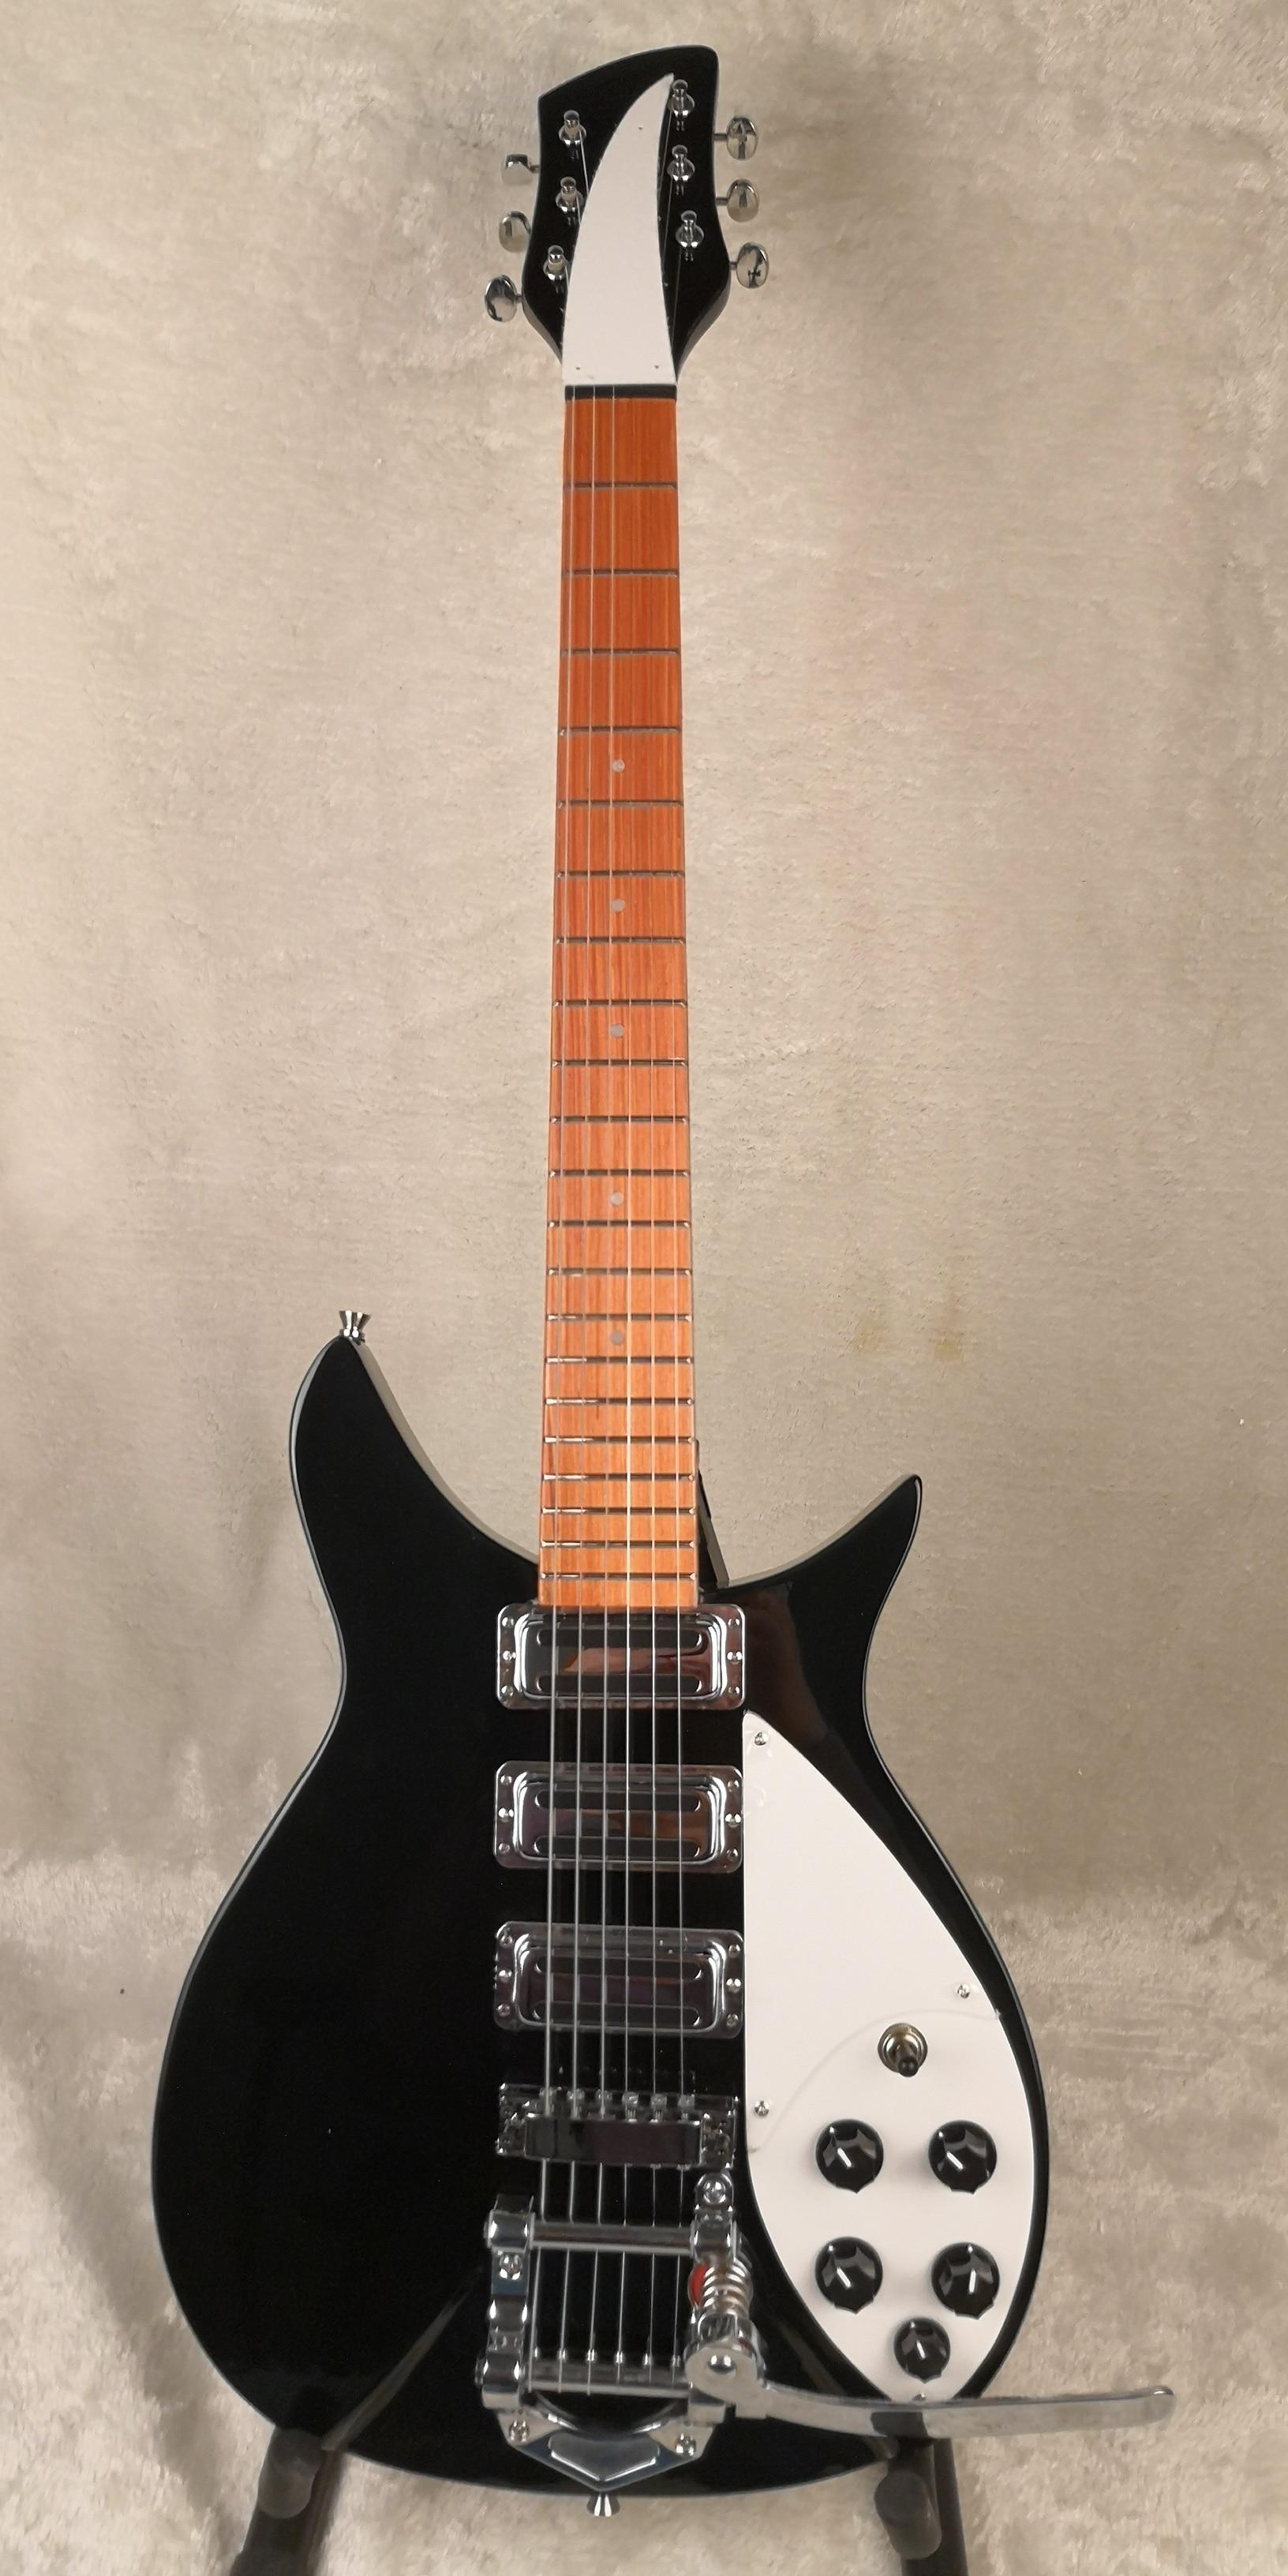 r electric guitar black 66string guitar supporters 3 picked up 325 models normal neck free. Black Bedroom Furniture Sets. Home Design Ideas